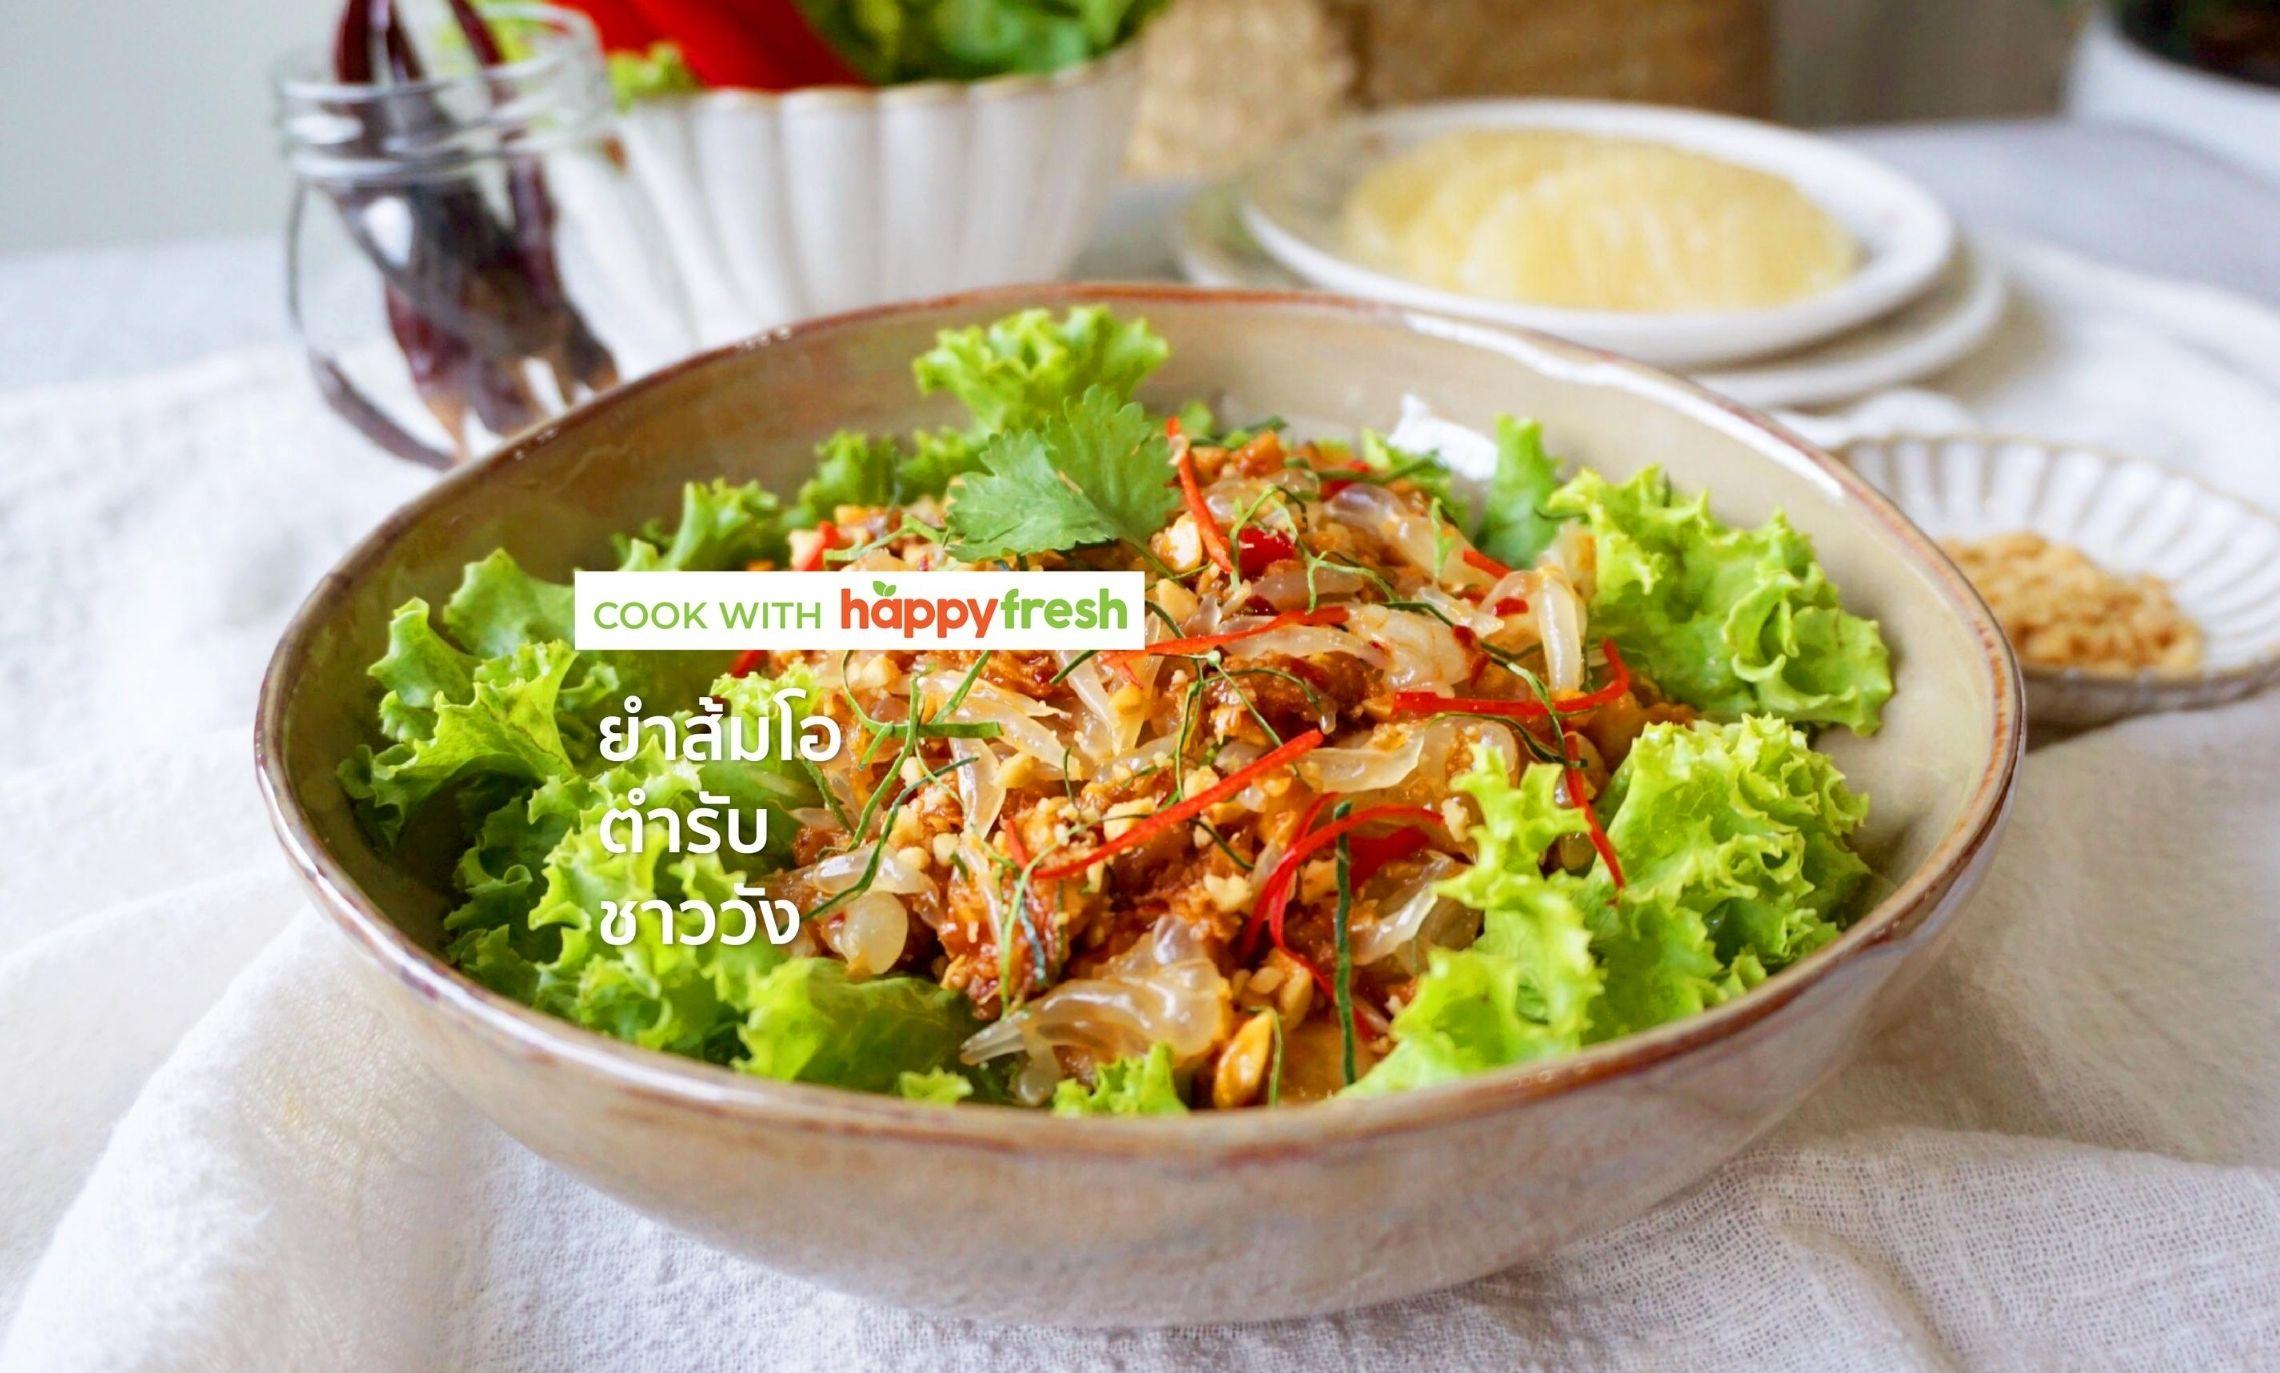 HappyFresh_Feature_Image_Thai_Pomelo_Spicy_Salad